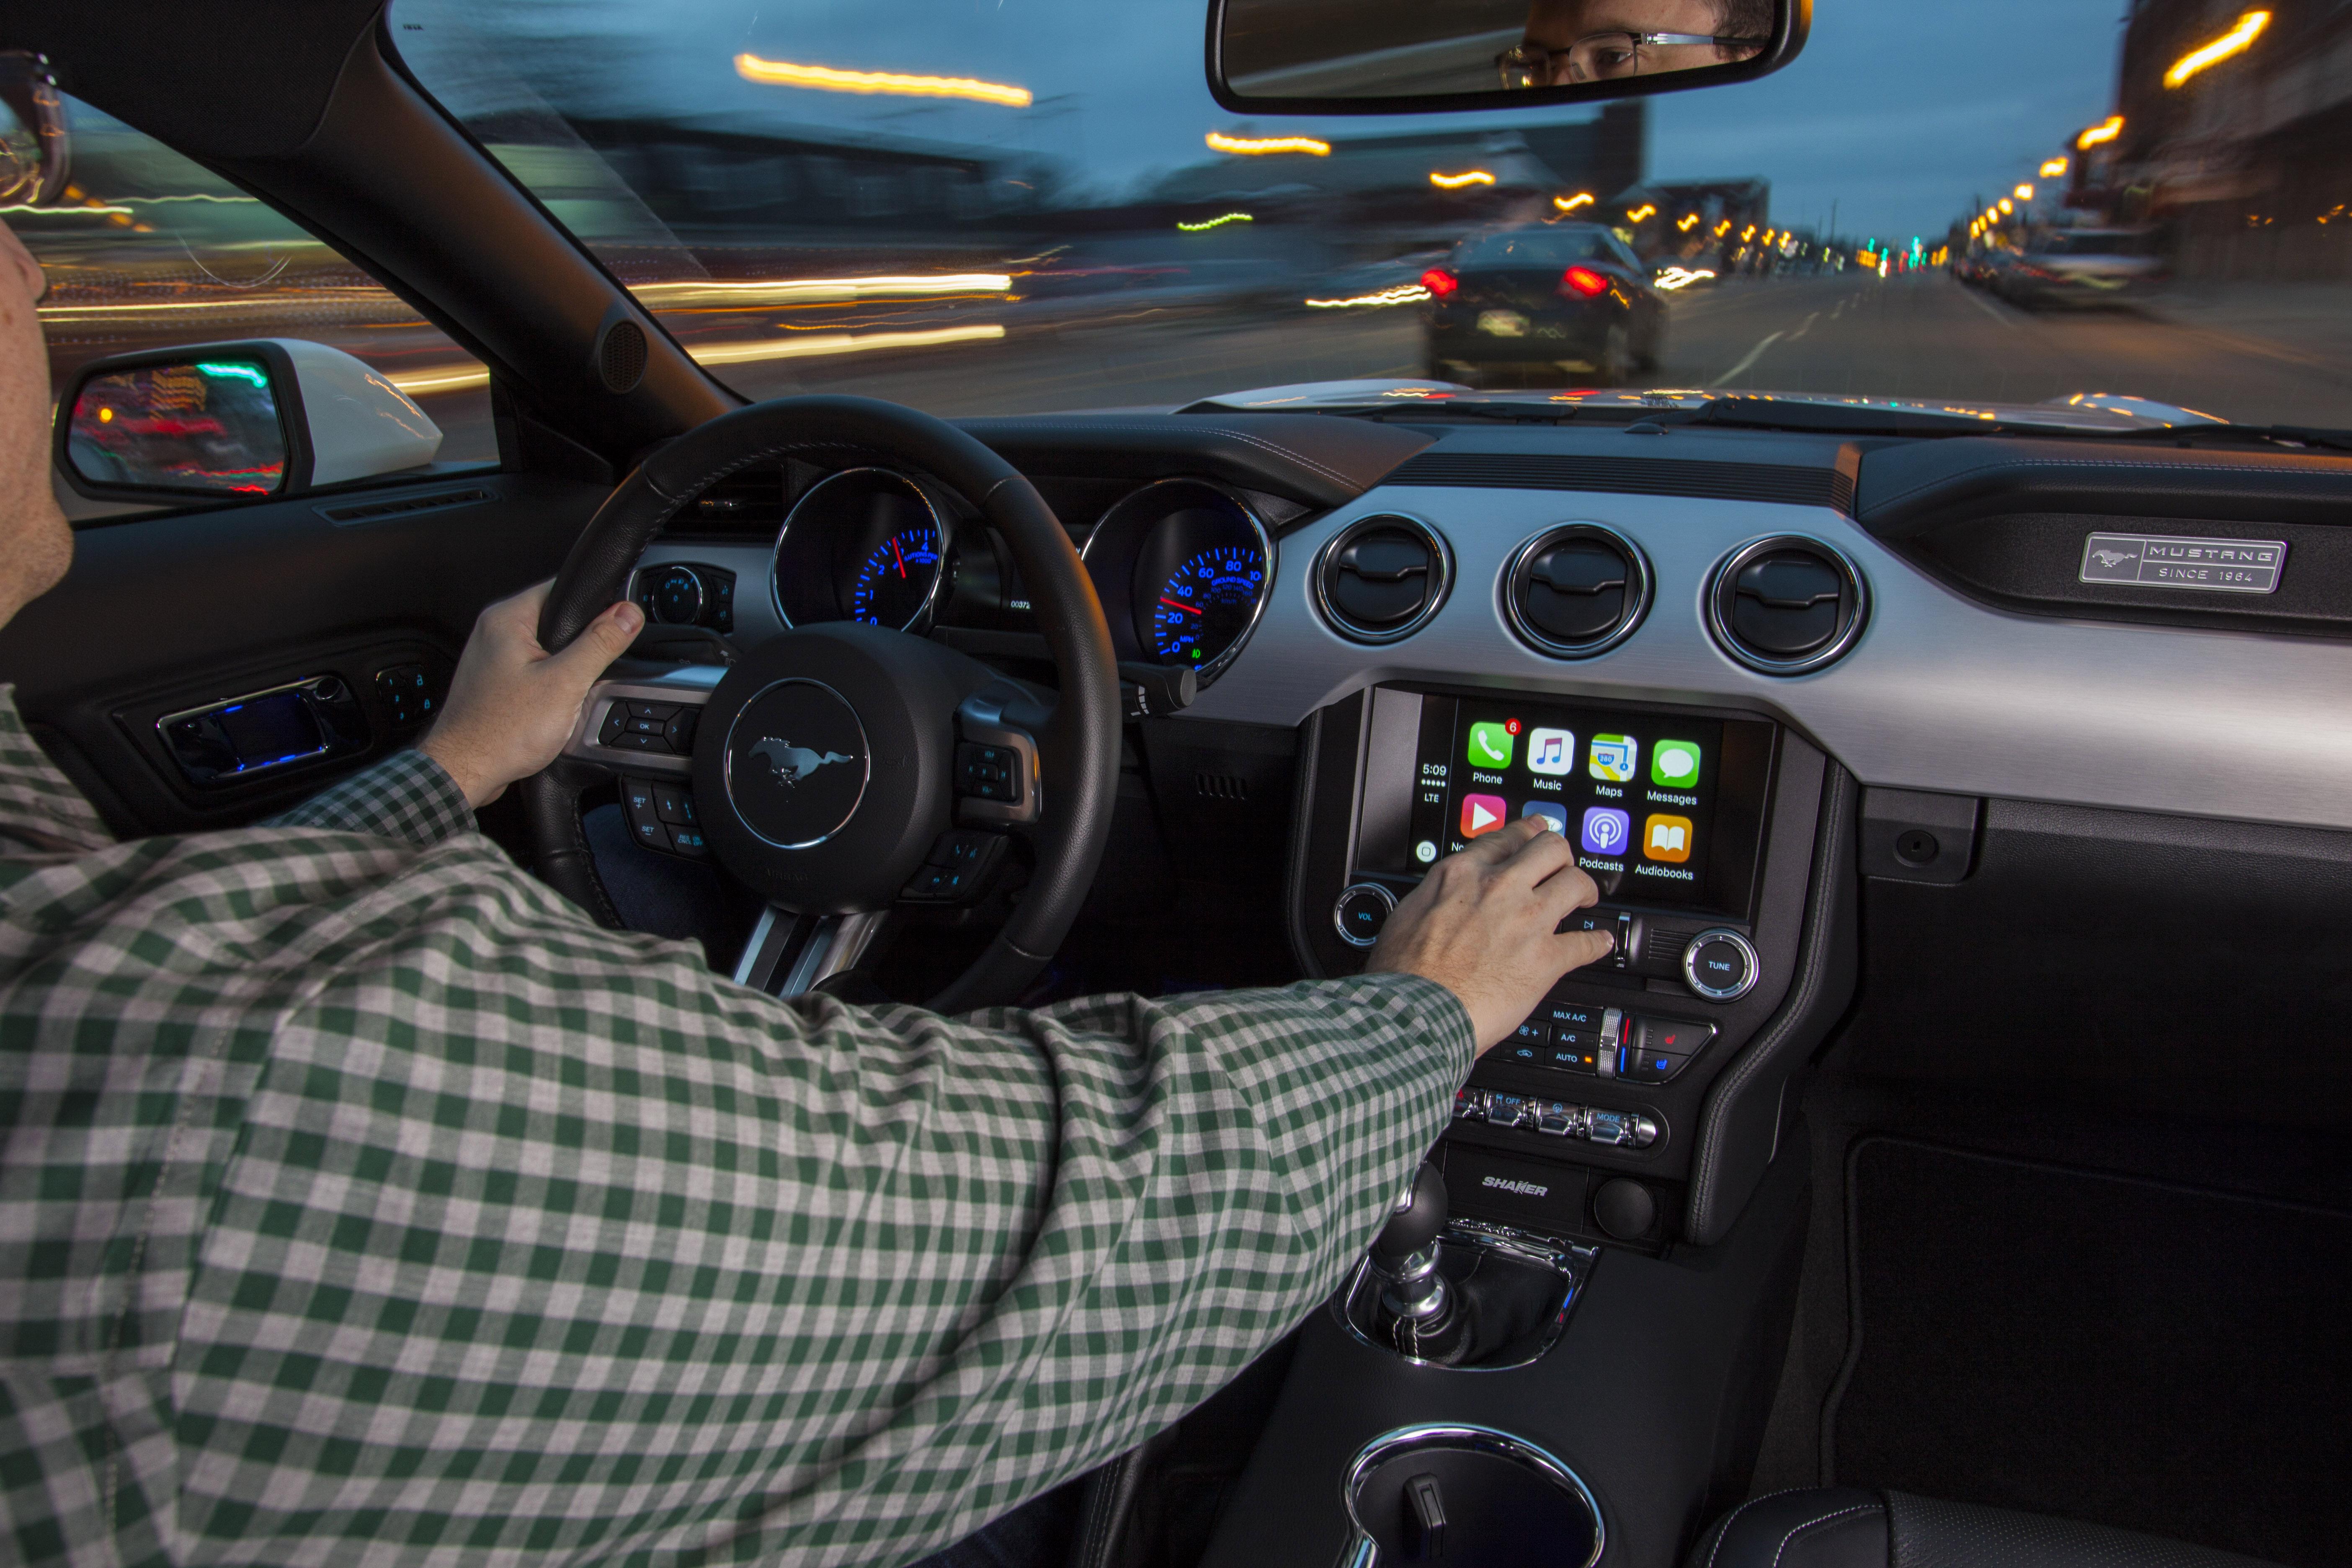 Here's what Google Maps looks like running on Apple CarPlay - The Verge